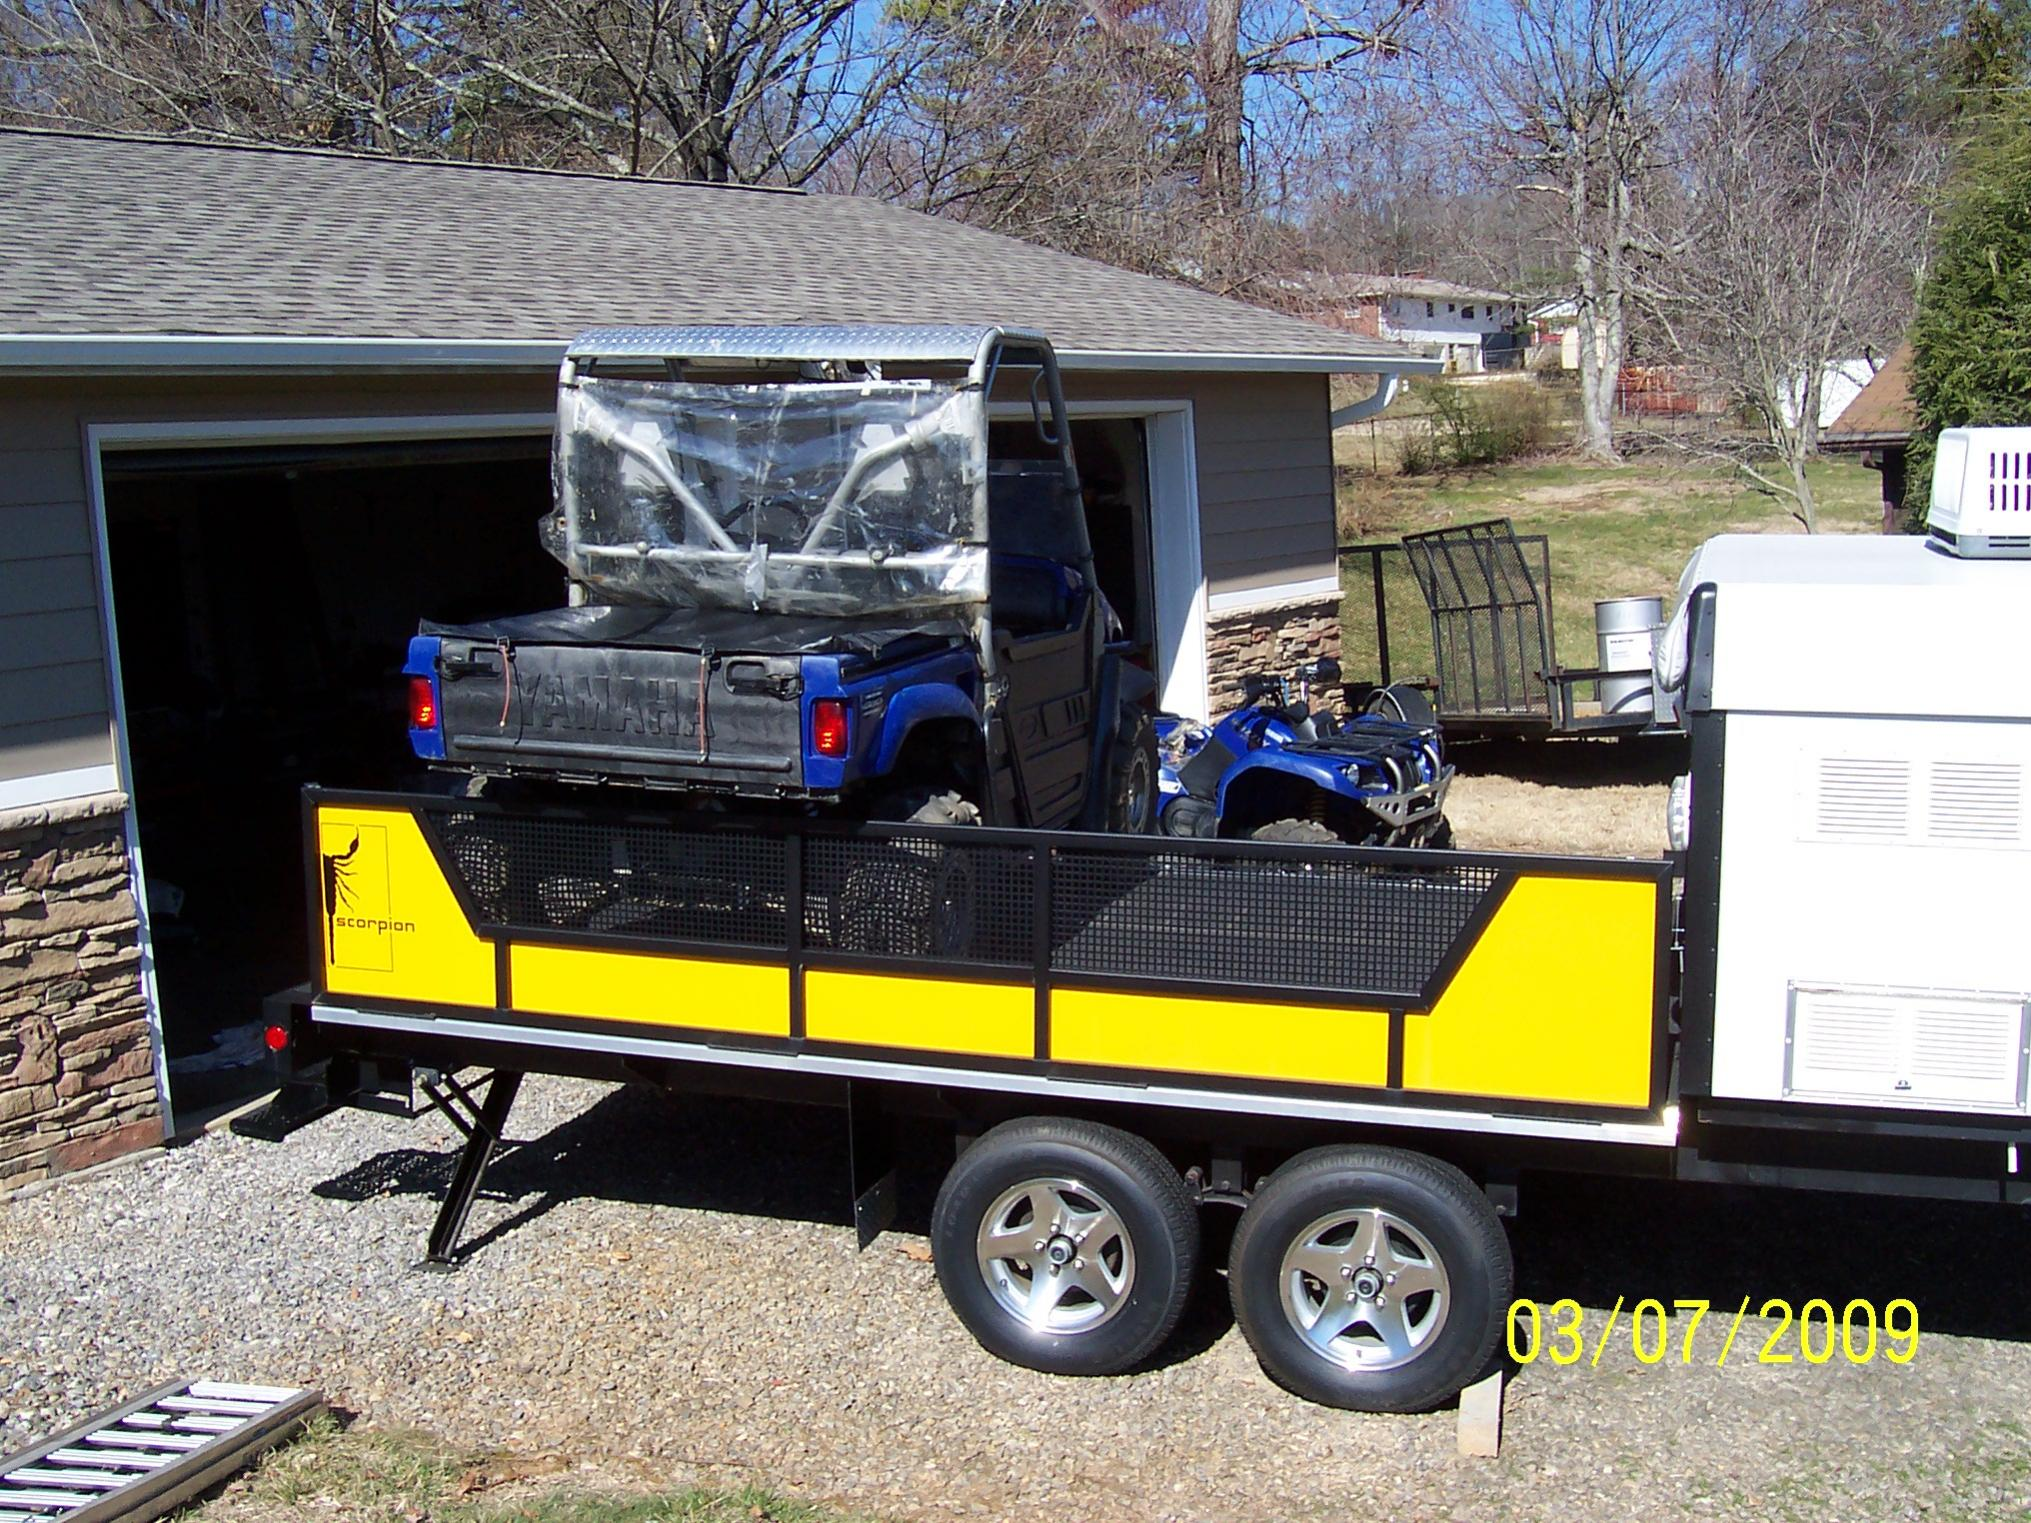 Fleetwood Scorpion S1 Toy Hauler Camper Yamaha Rhino